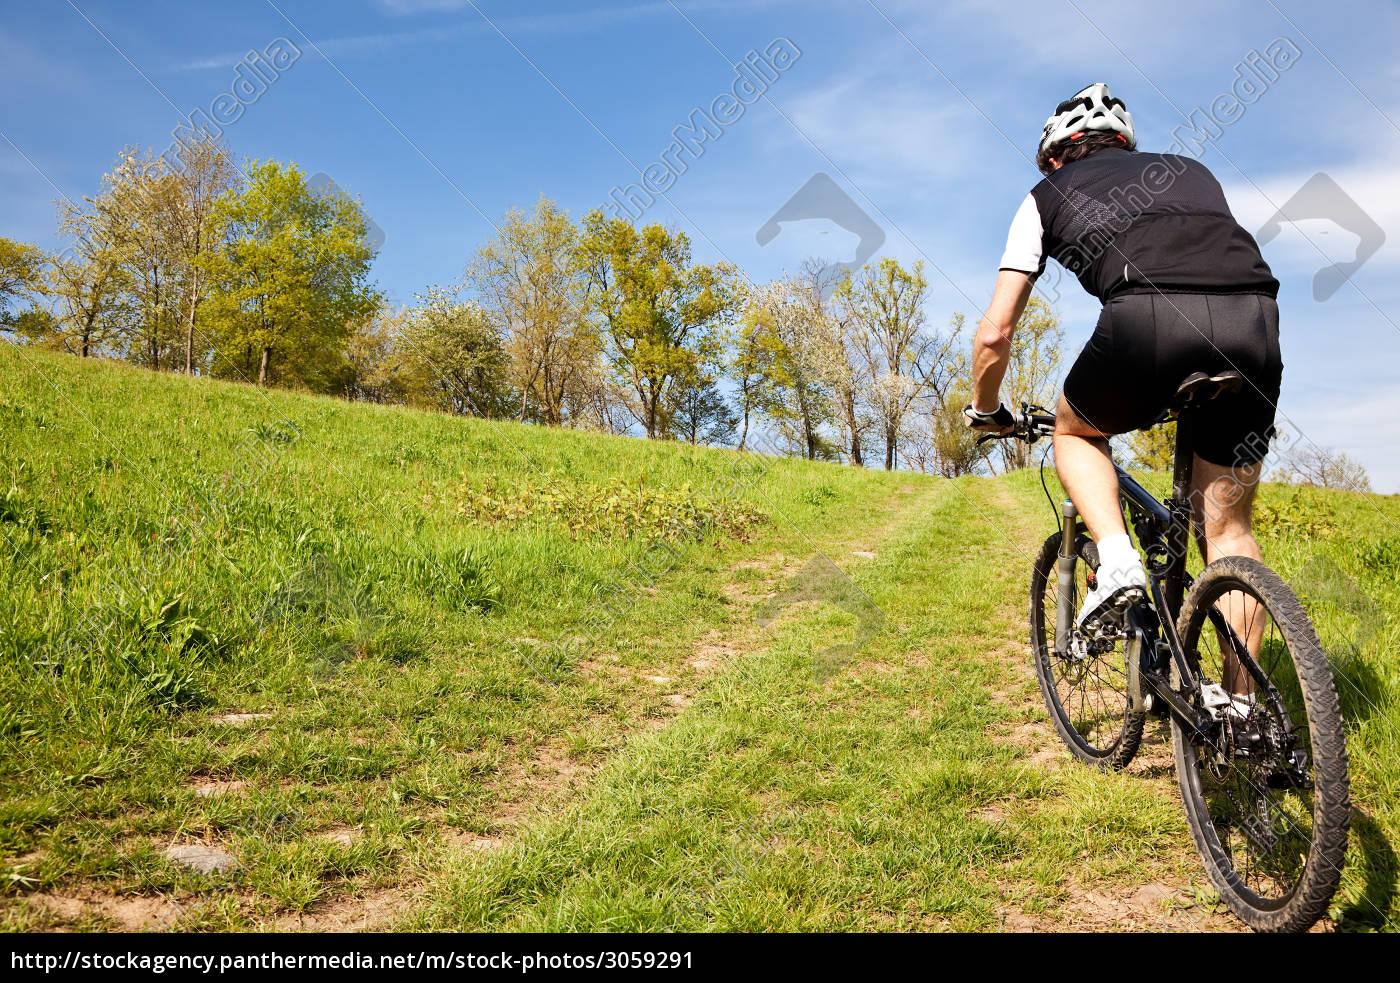 mountain, bike, cyclist, riding, uphill - 3059291